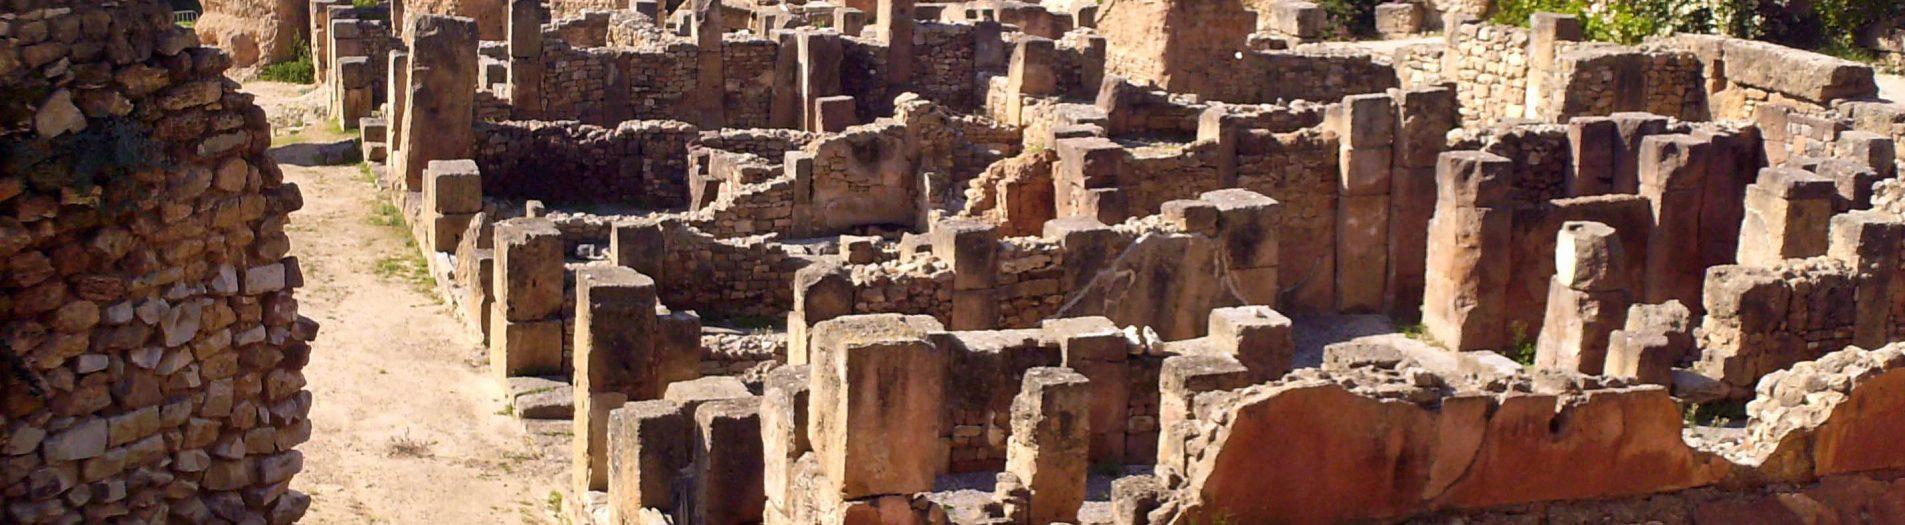 Carthage punique